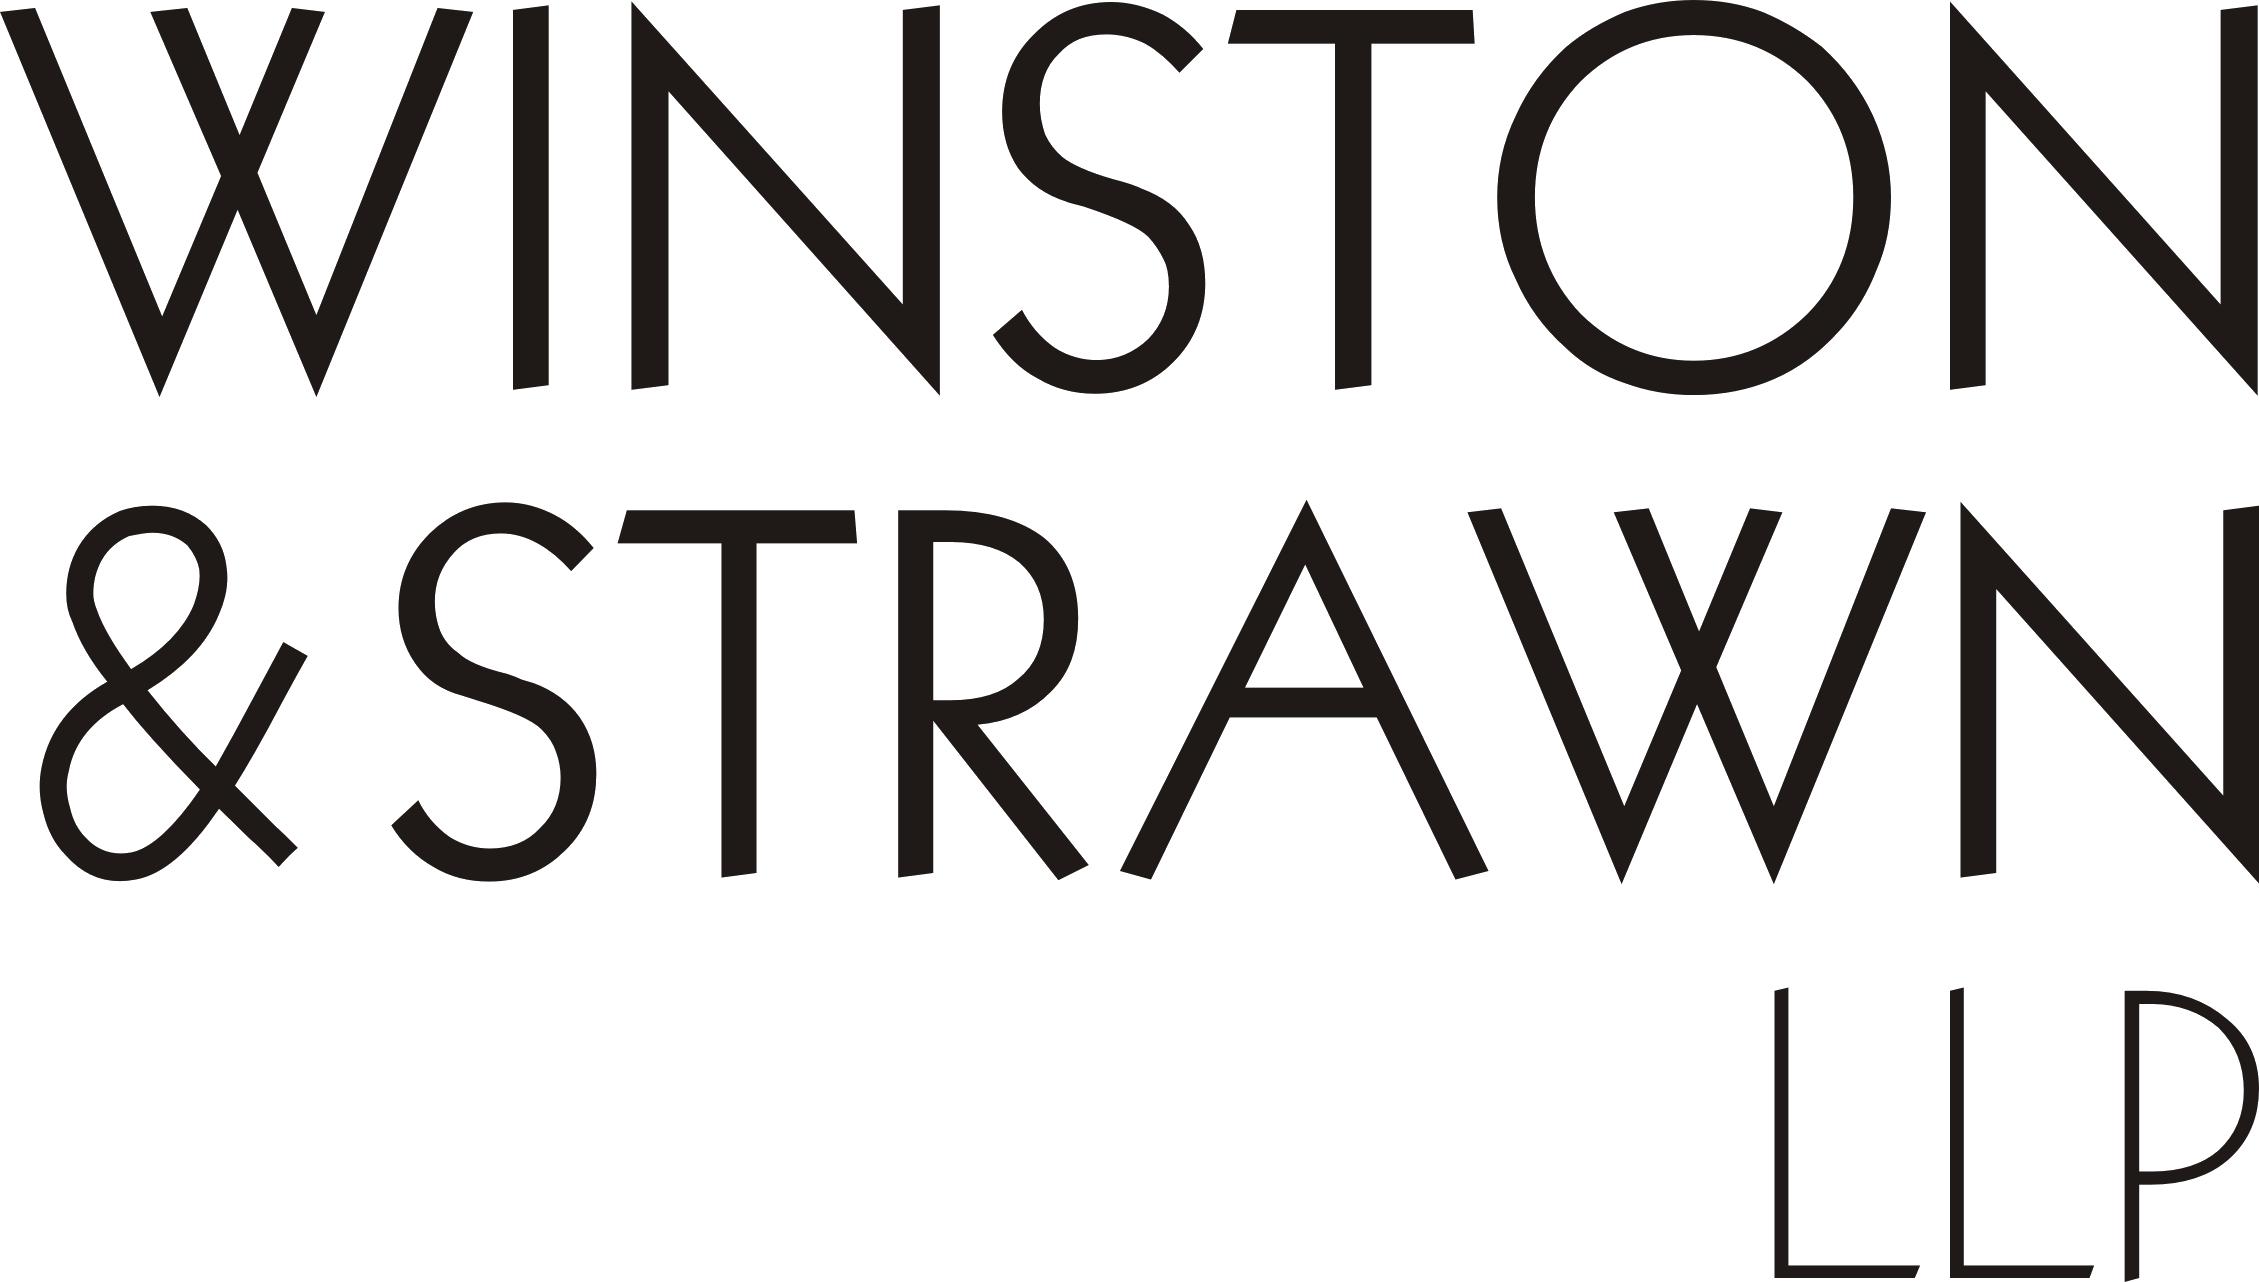 Winston Strawn logo